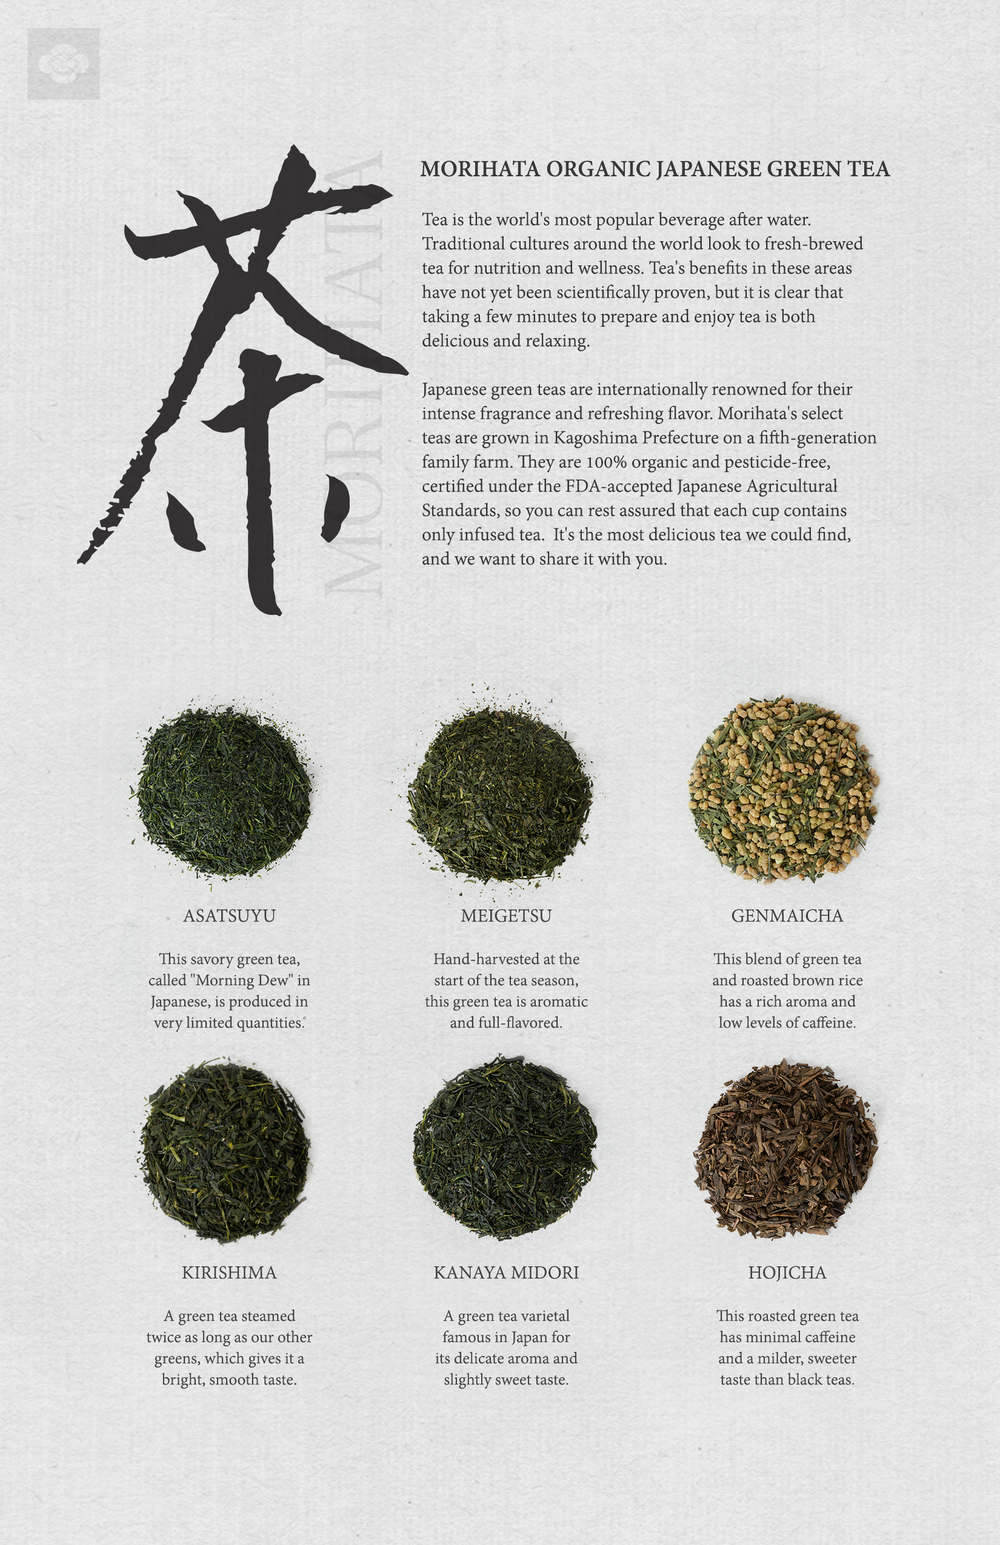 morihata-tea-rikumo-organic